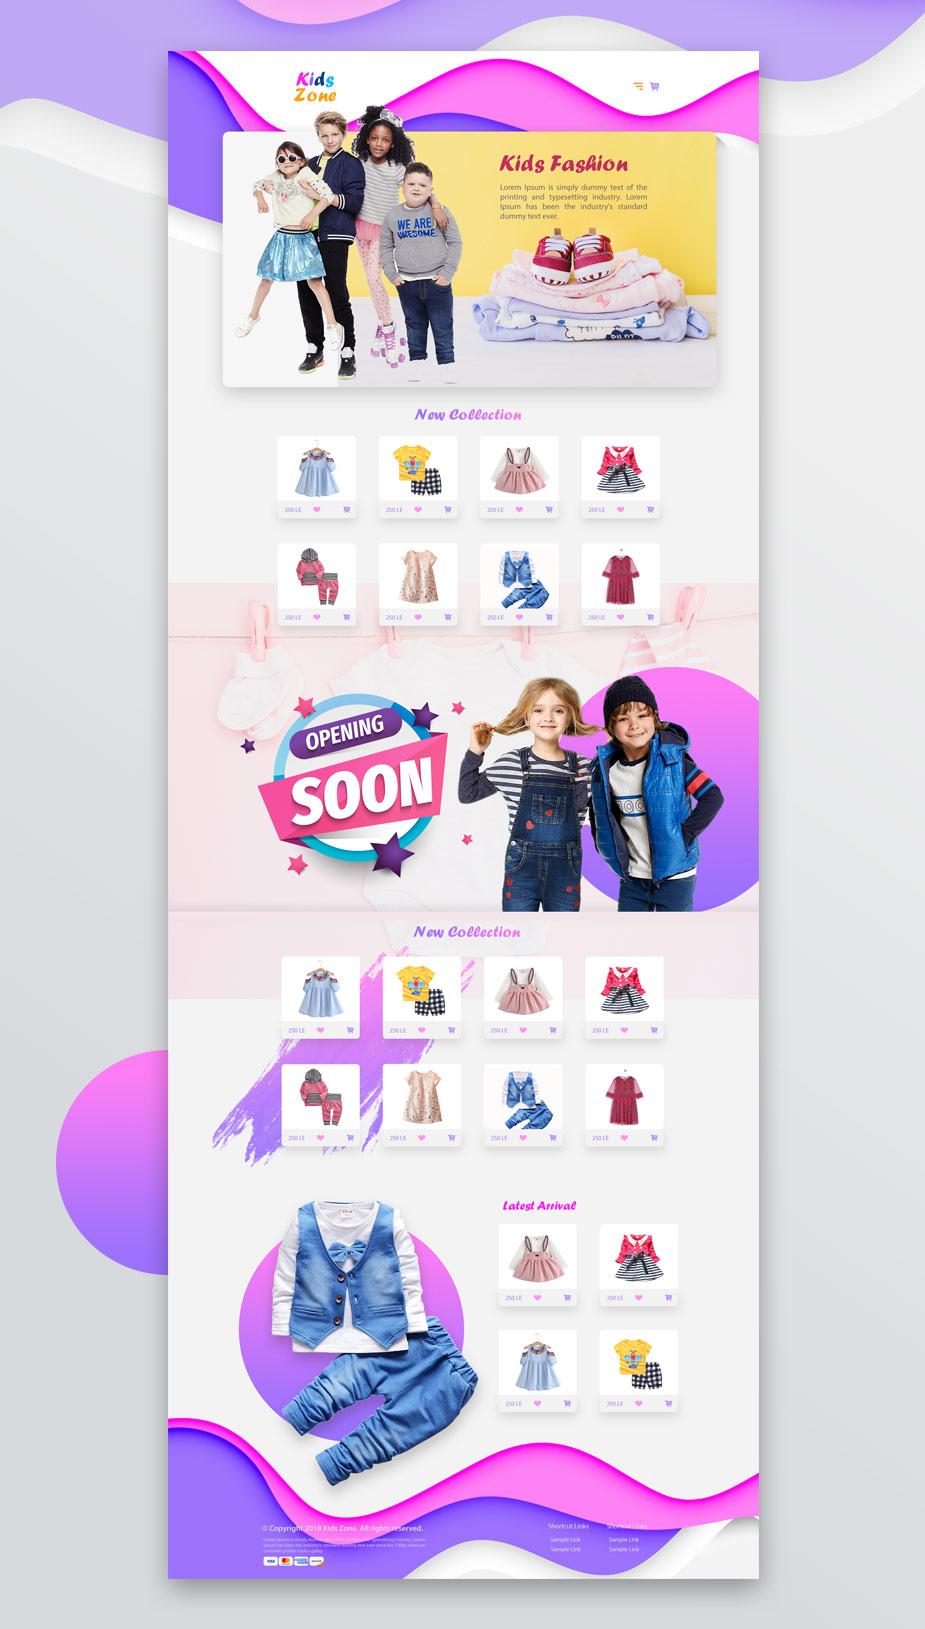 kids-fashion-website-design-waleed-sayed